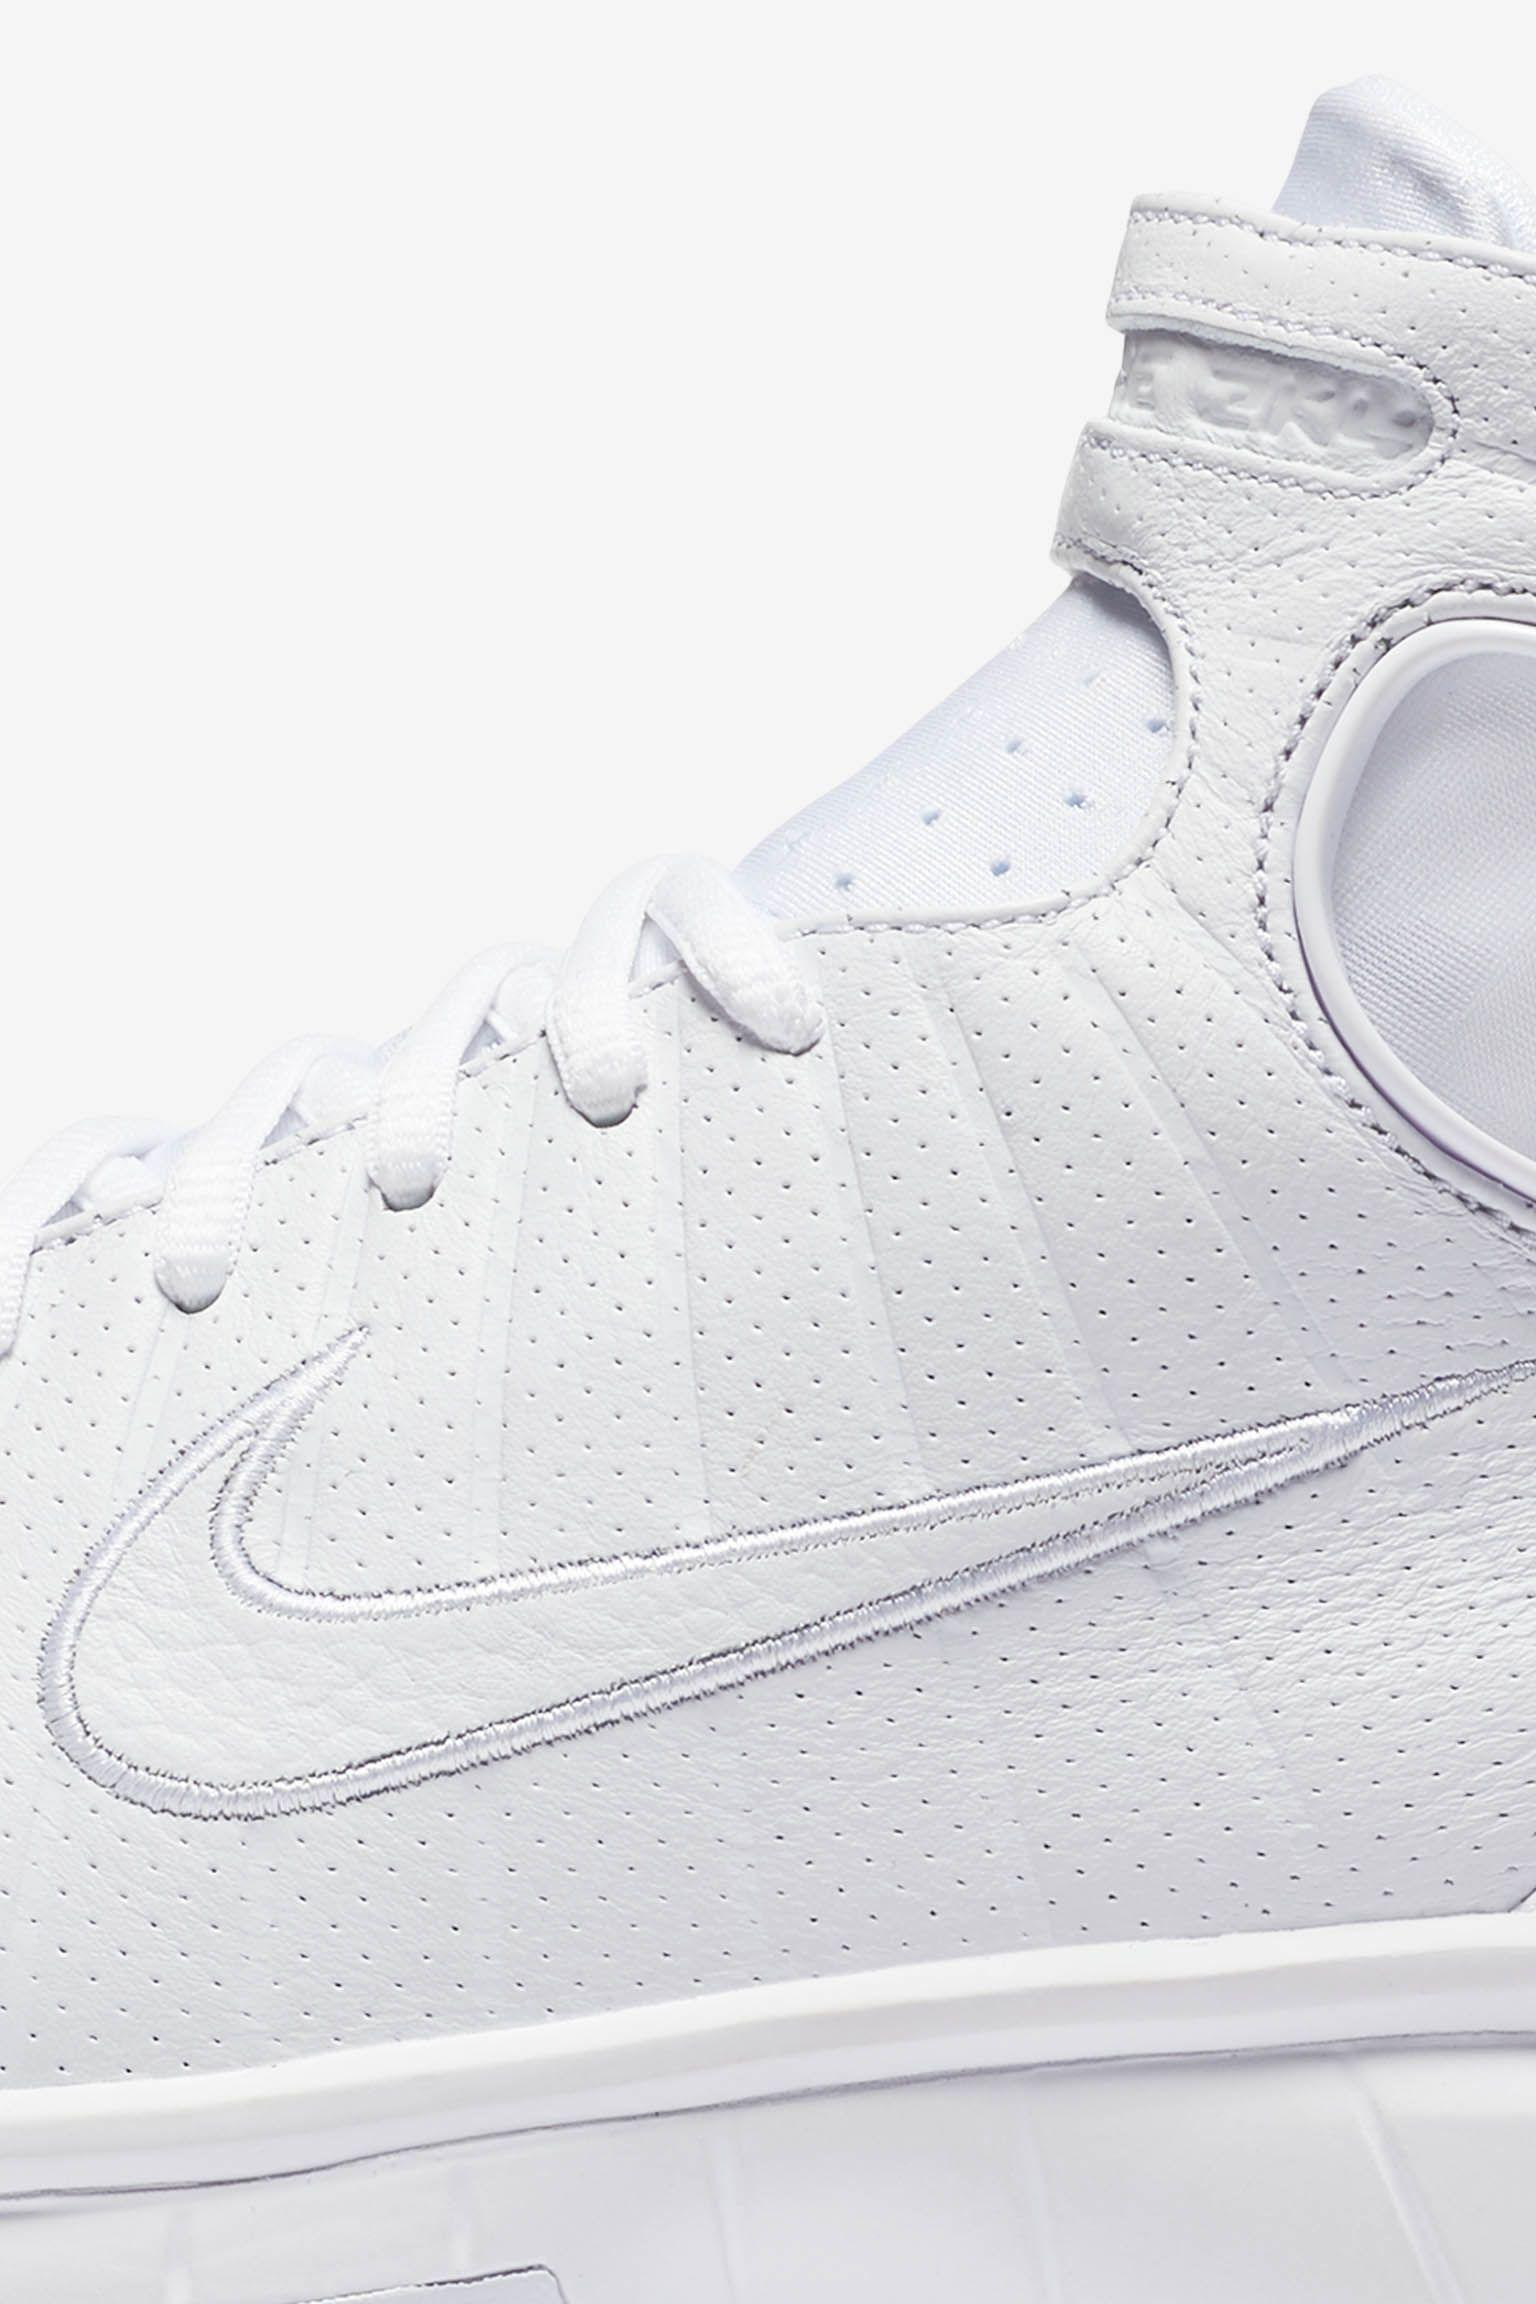 Nike Zoom Huarache 2K4 'FTB'